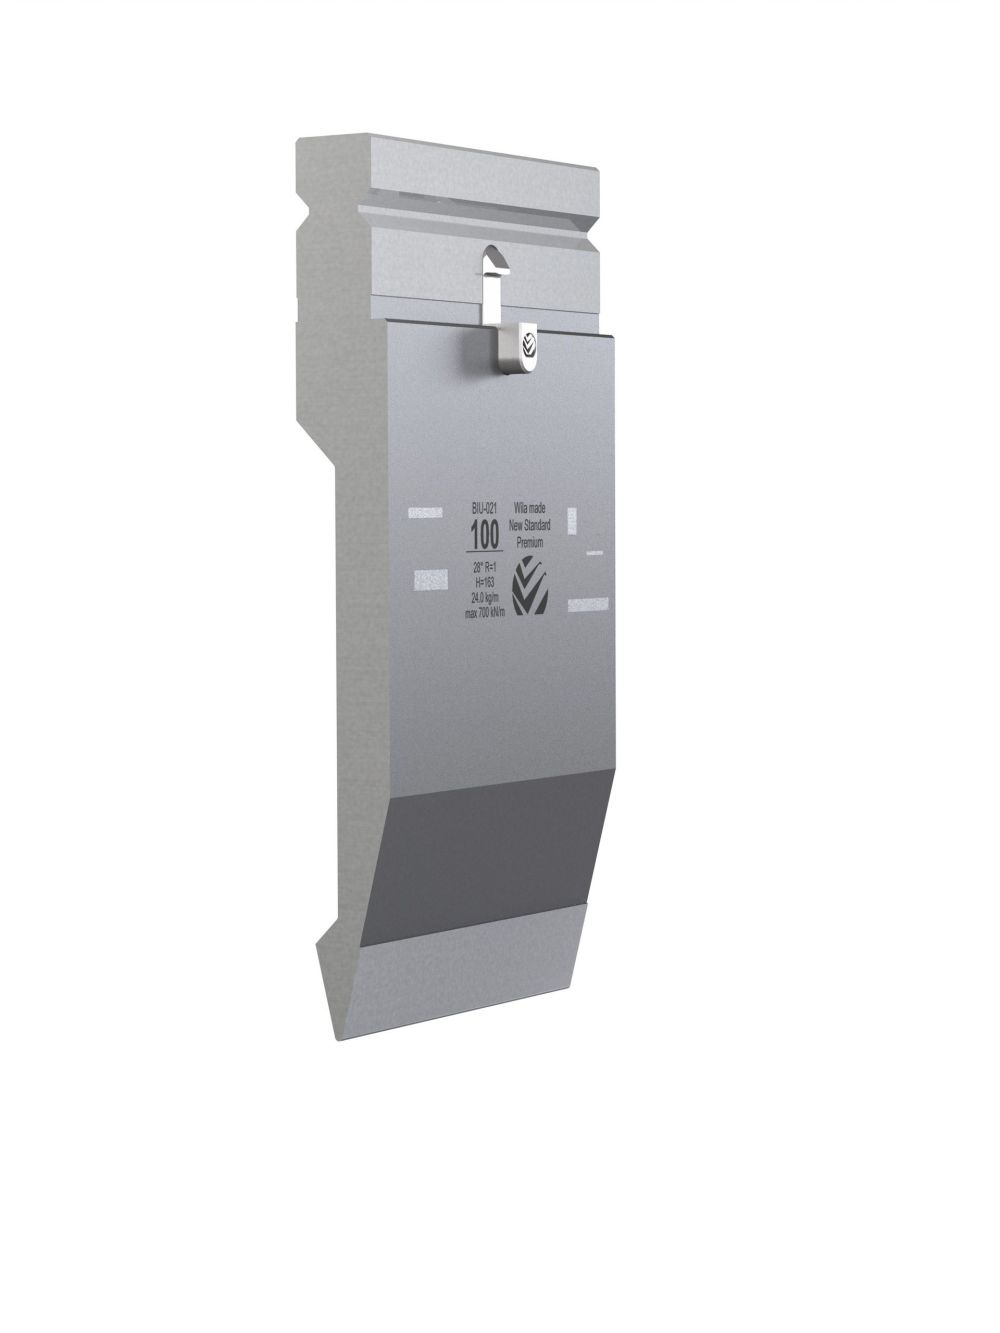 WILA BIU-021/2 New Standard Premium Top Tool H=163mm, a=28°, R=1mm, max.load: 70ton/m 550mm (SEGMENTED) OPEN BOX, NEW